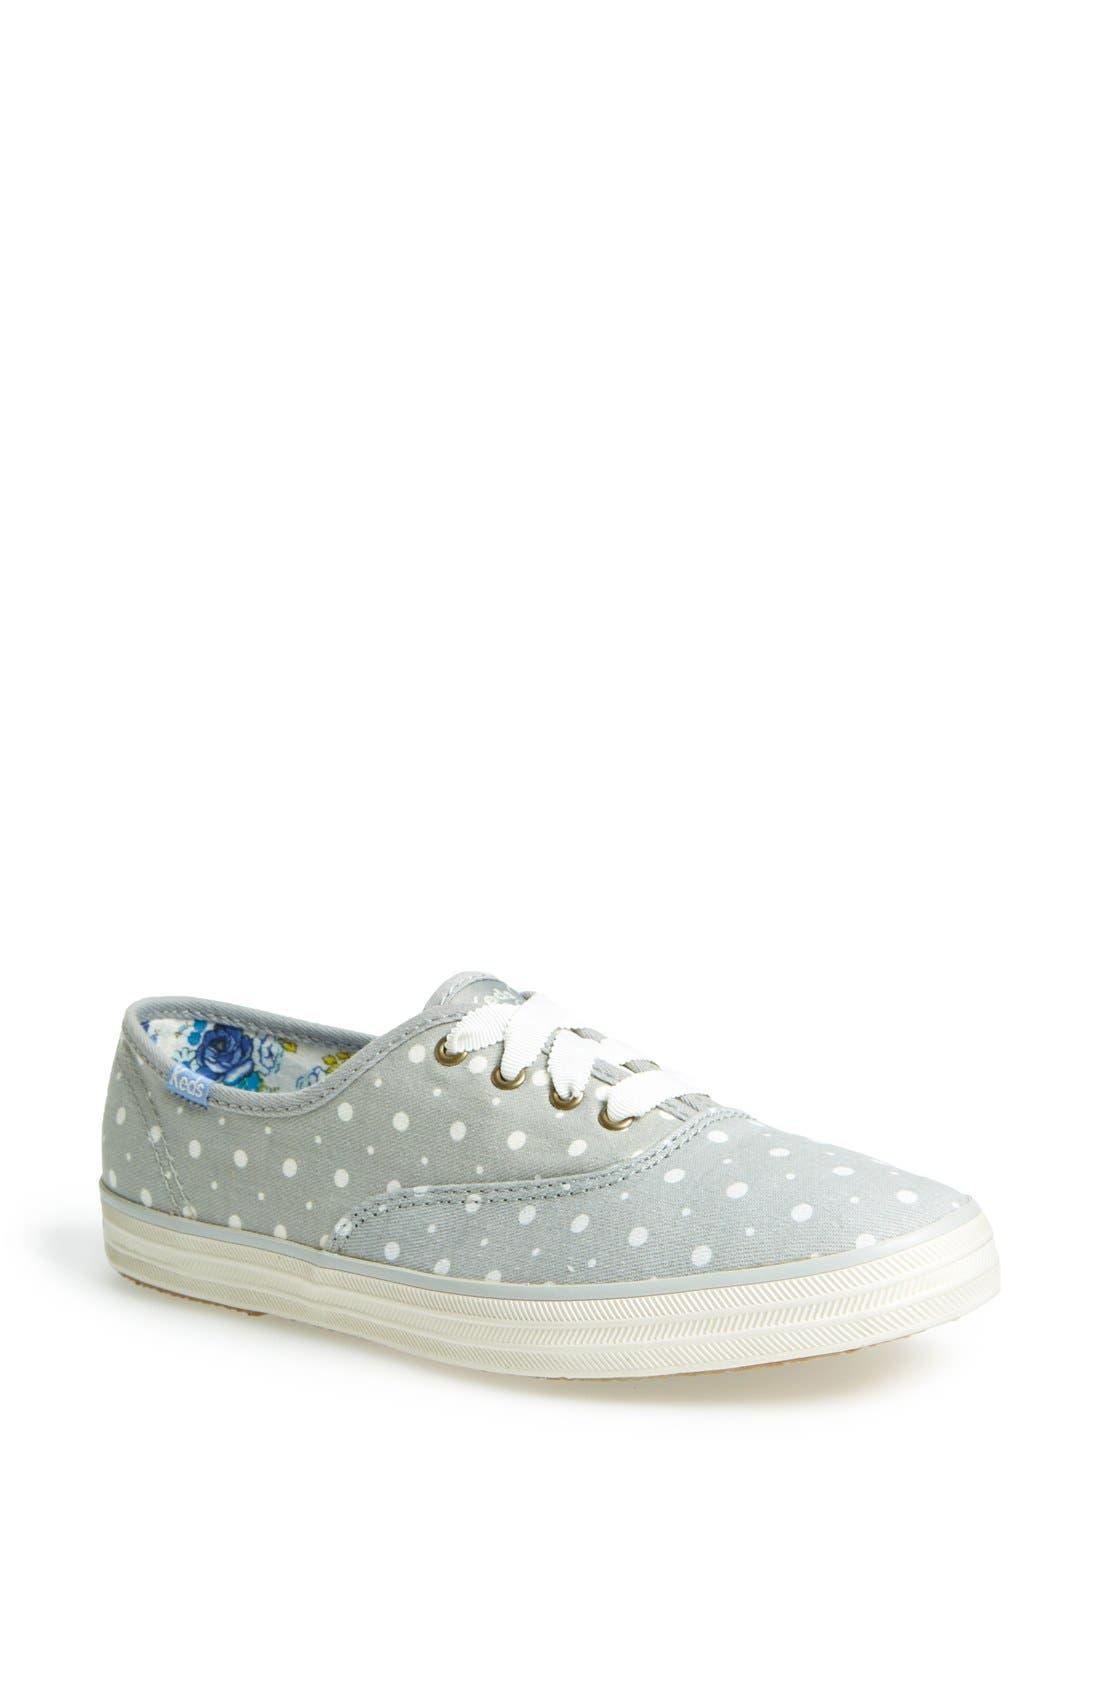 KEDS<SUP>®</SUP> Taylor Swift Polka Dot Sneaker, Main, color, 020